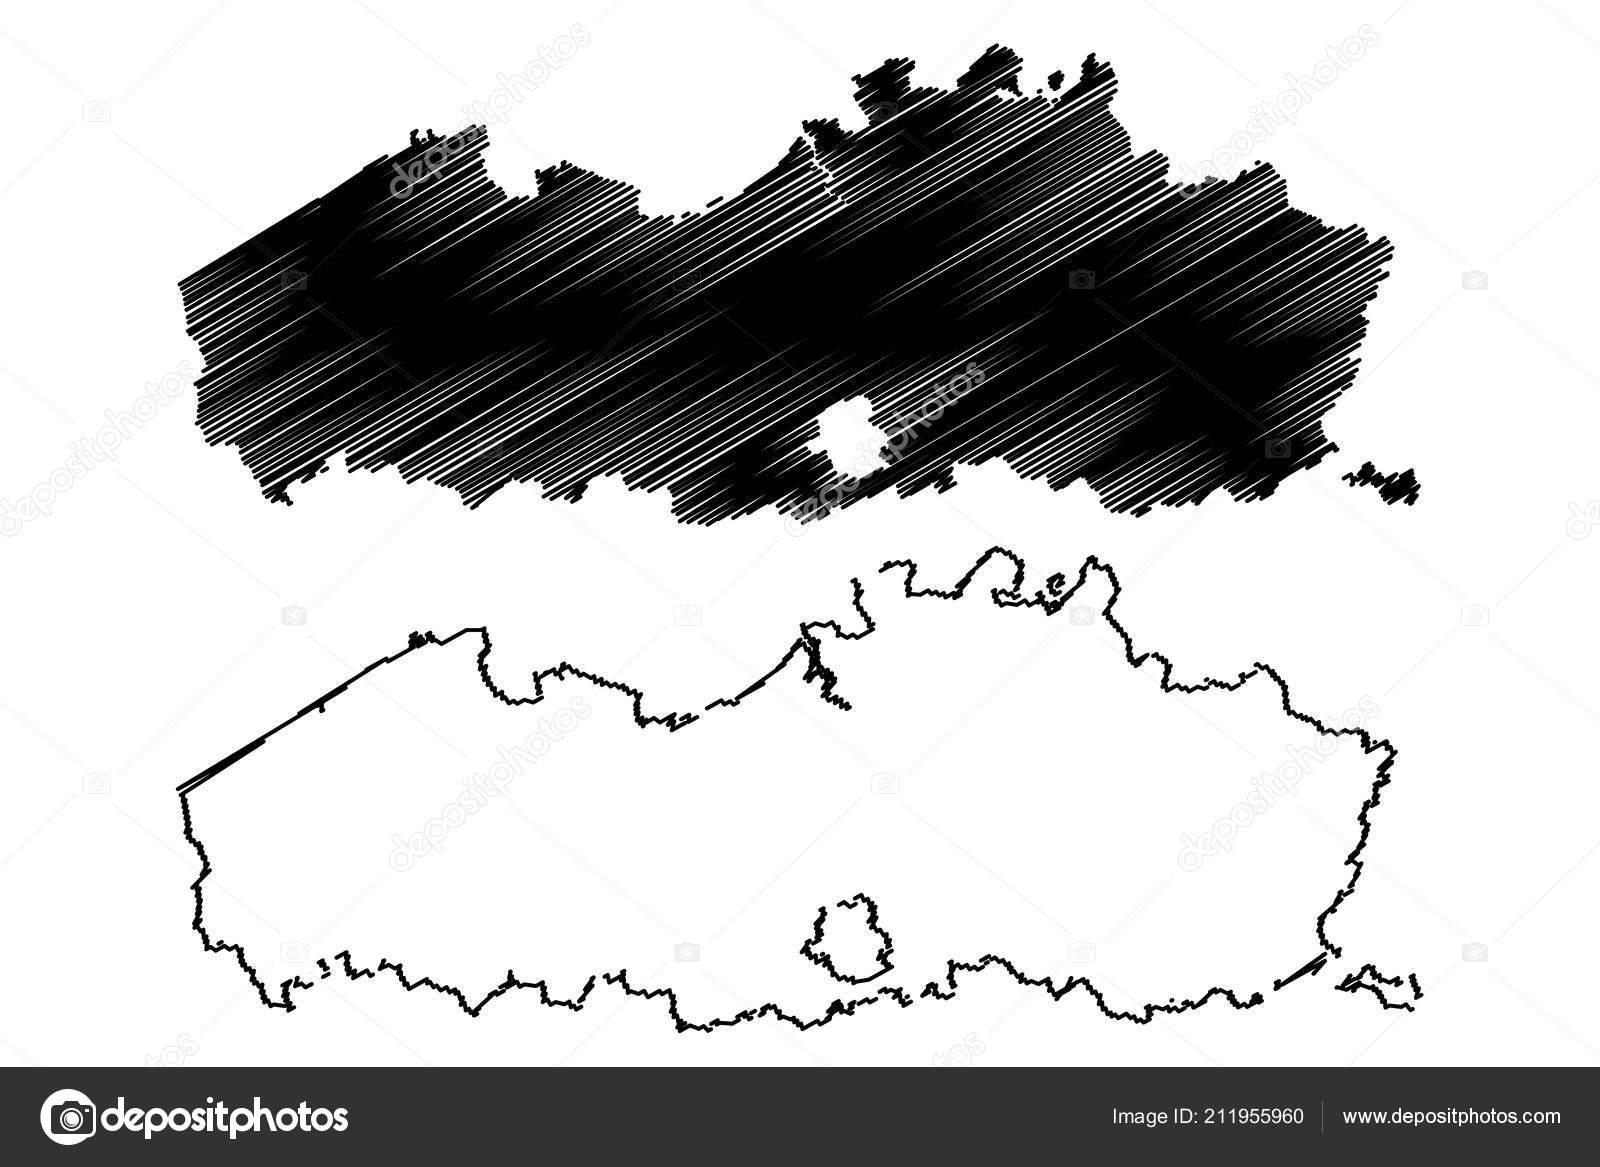 Carte Belgique Communautes Et Regions.Flandre Region Belgique Royaume Belgique Communaute Carte Vector